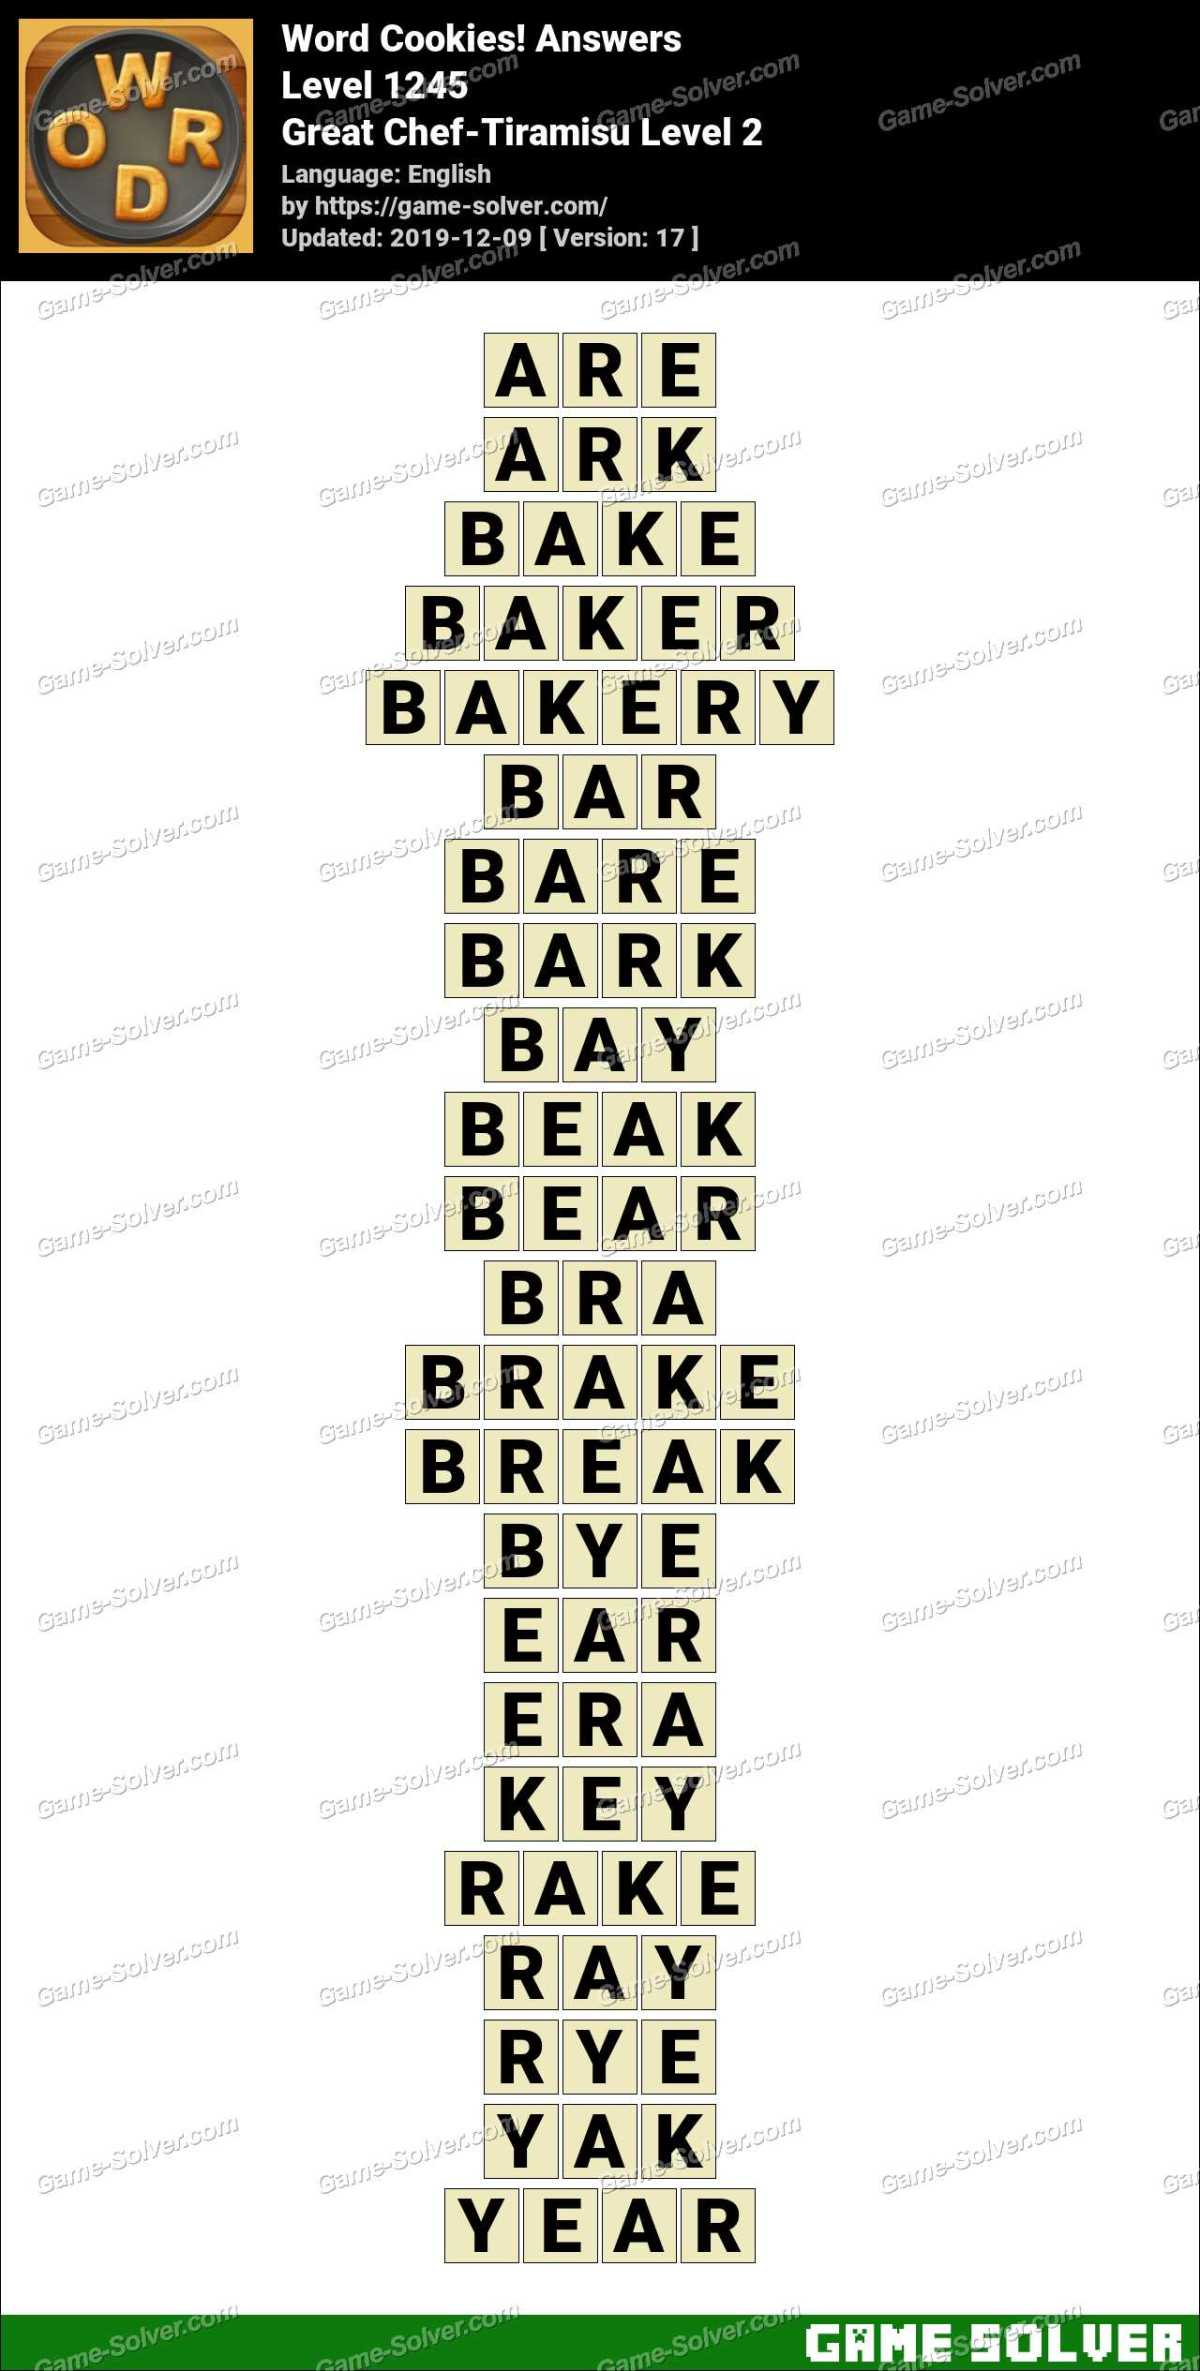 Word Cookies Great Chef-Tiramisu Level 2 Answers